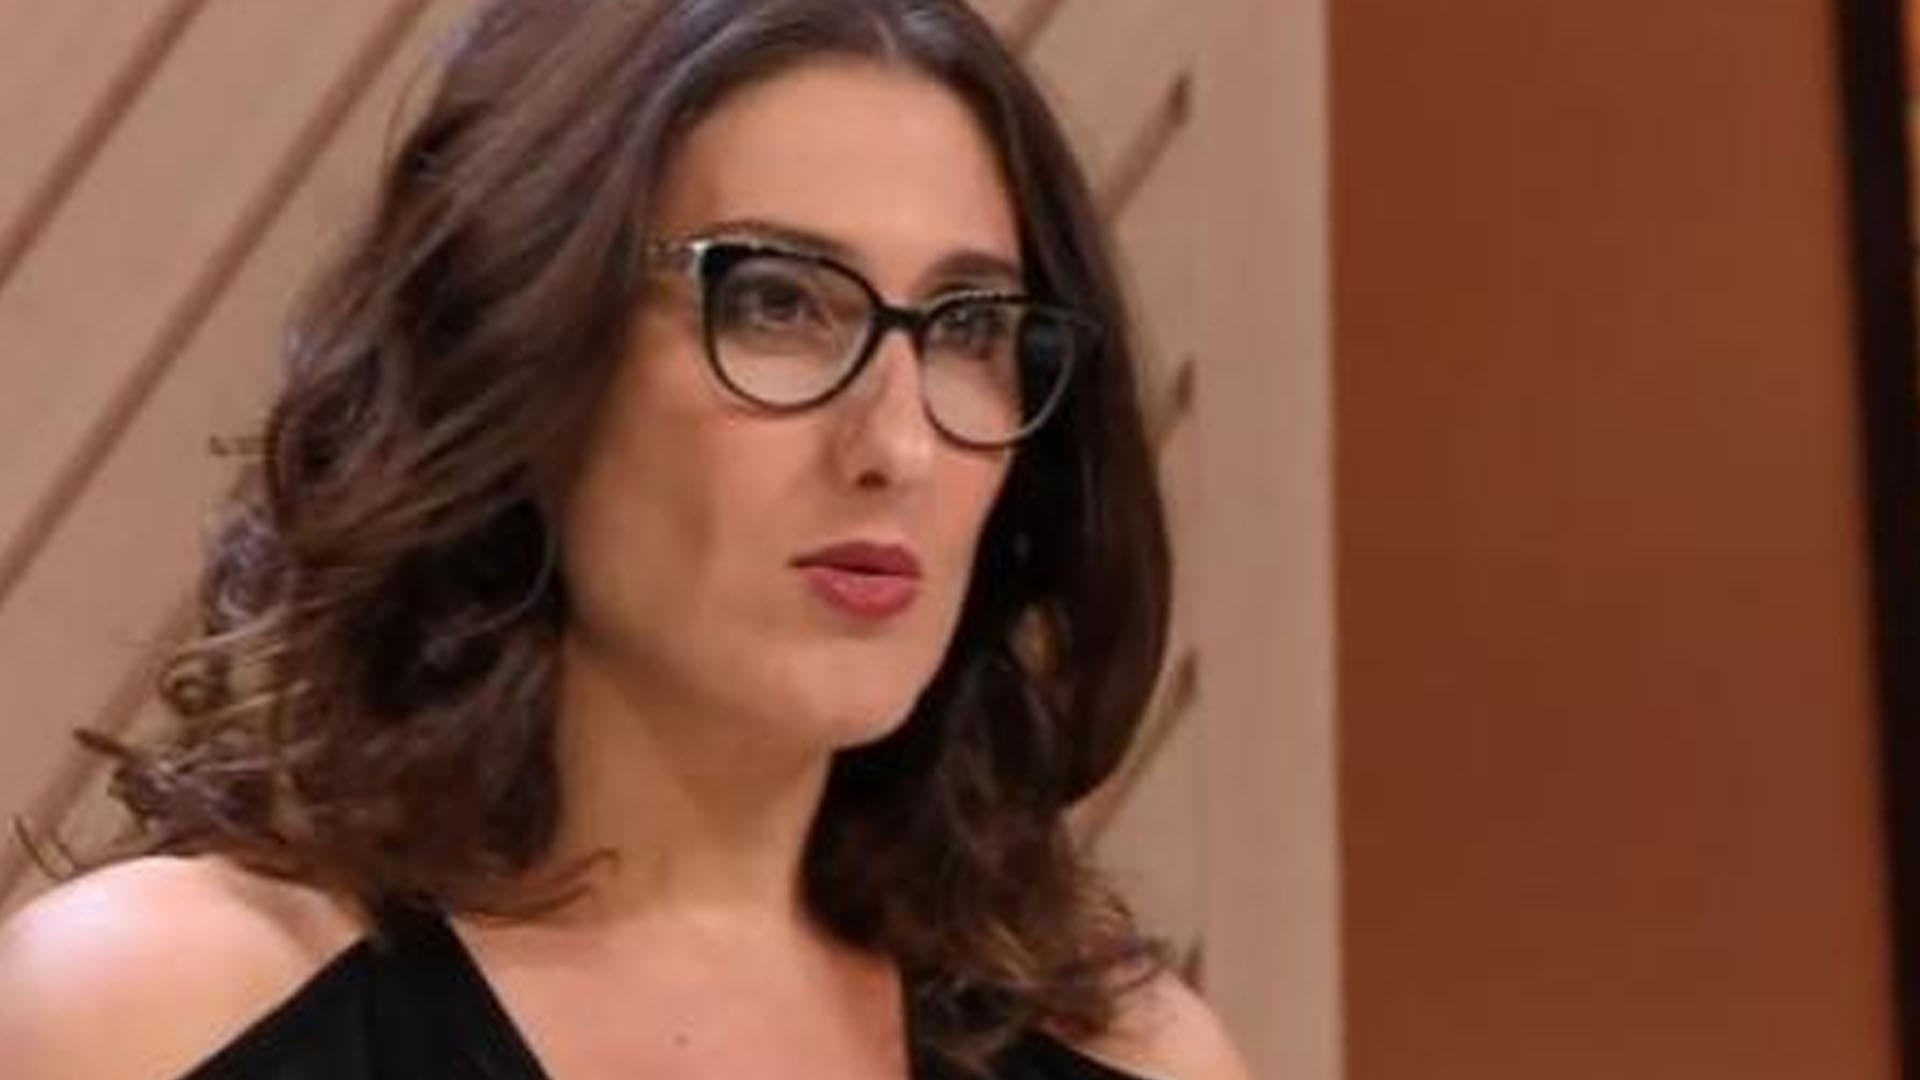 Masterchef Brasil: após final controversa, Paola Carosella discute na web